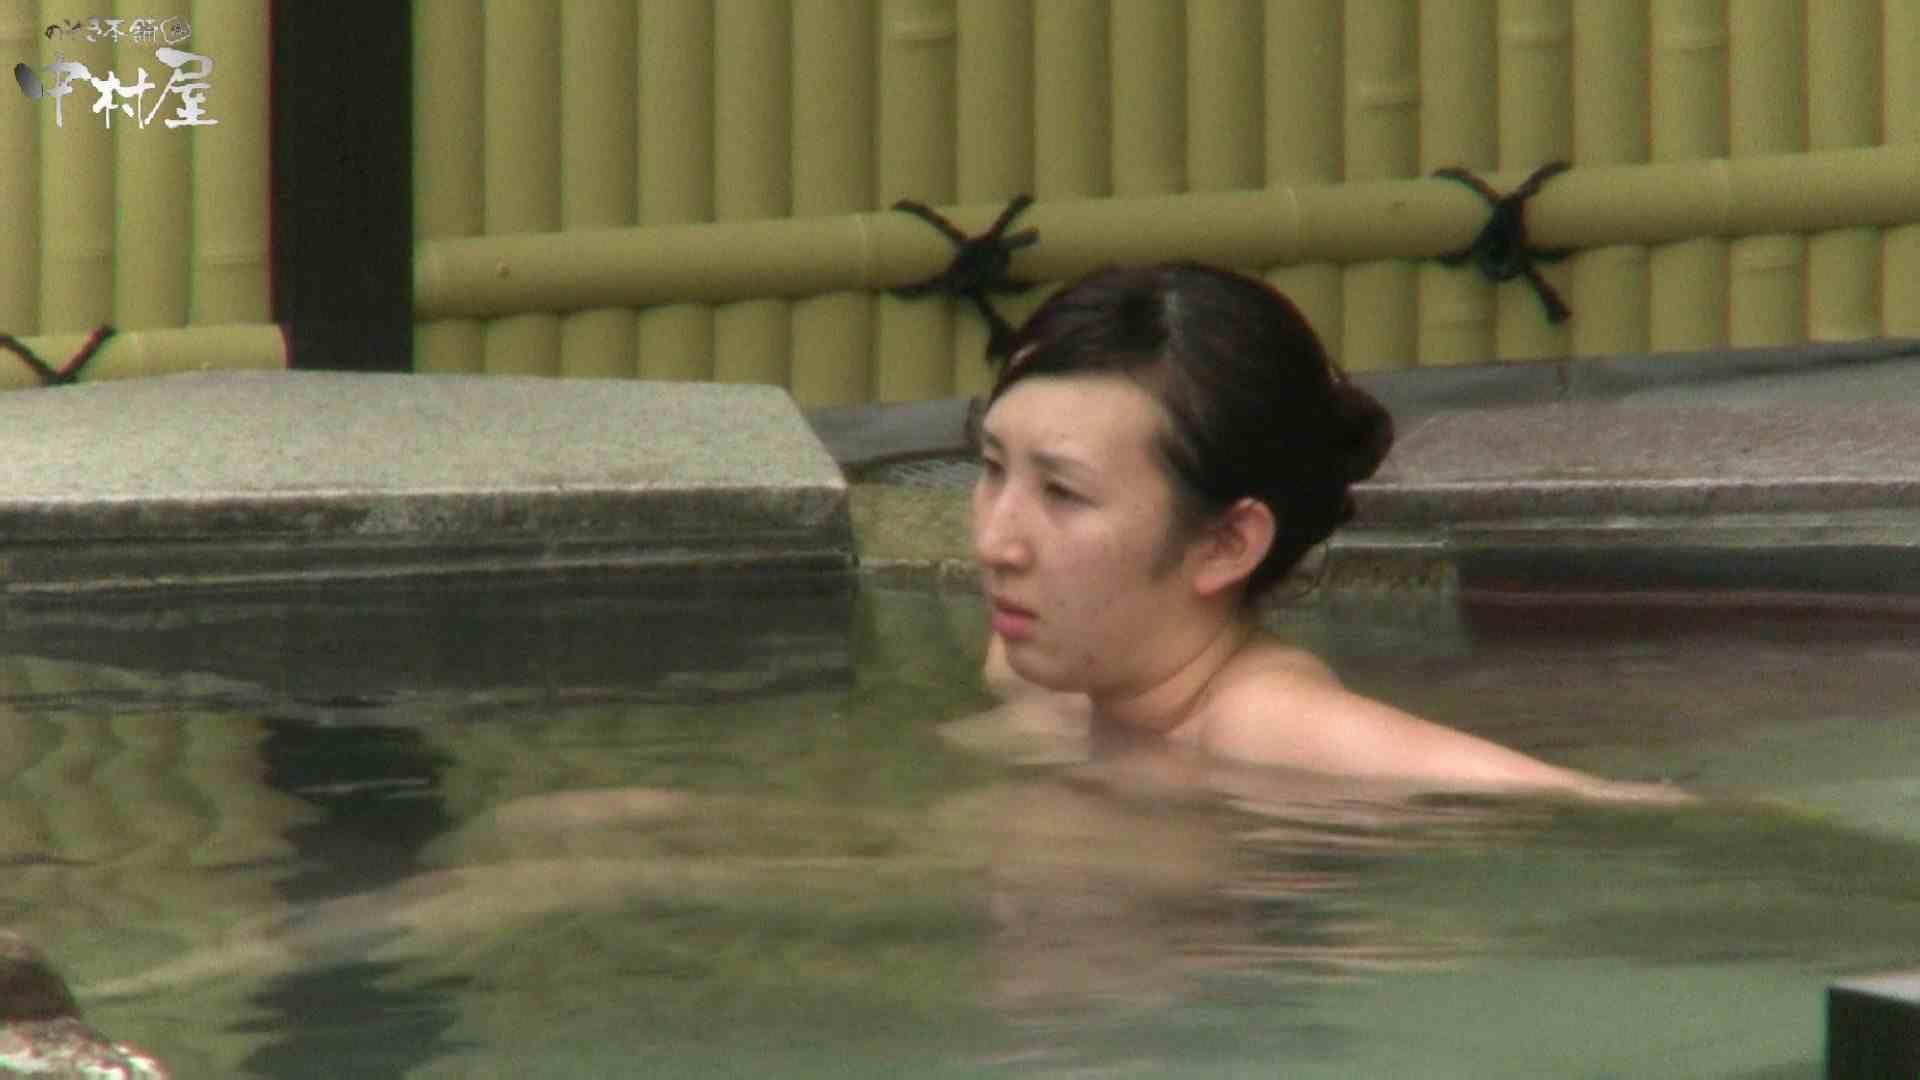 Aquaな露天風呂Vol.948 盗撮 AV無料 88枚 17